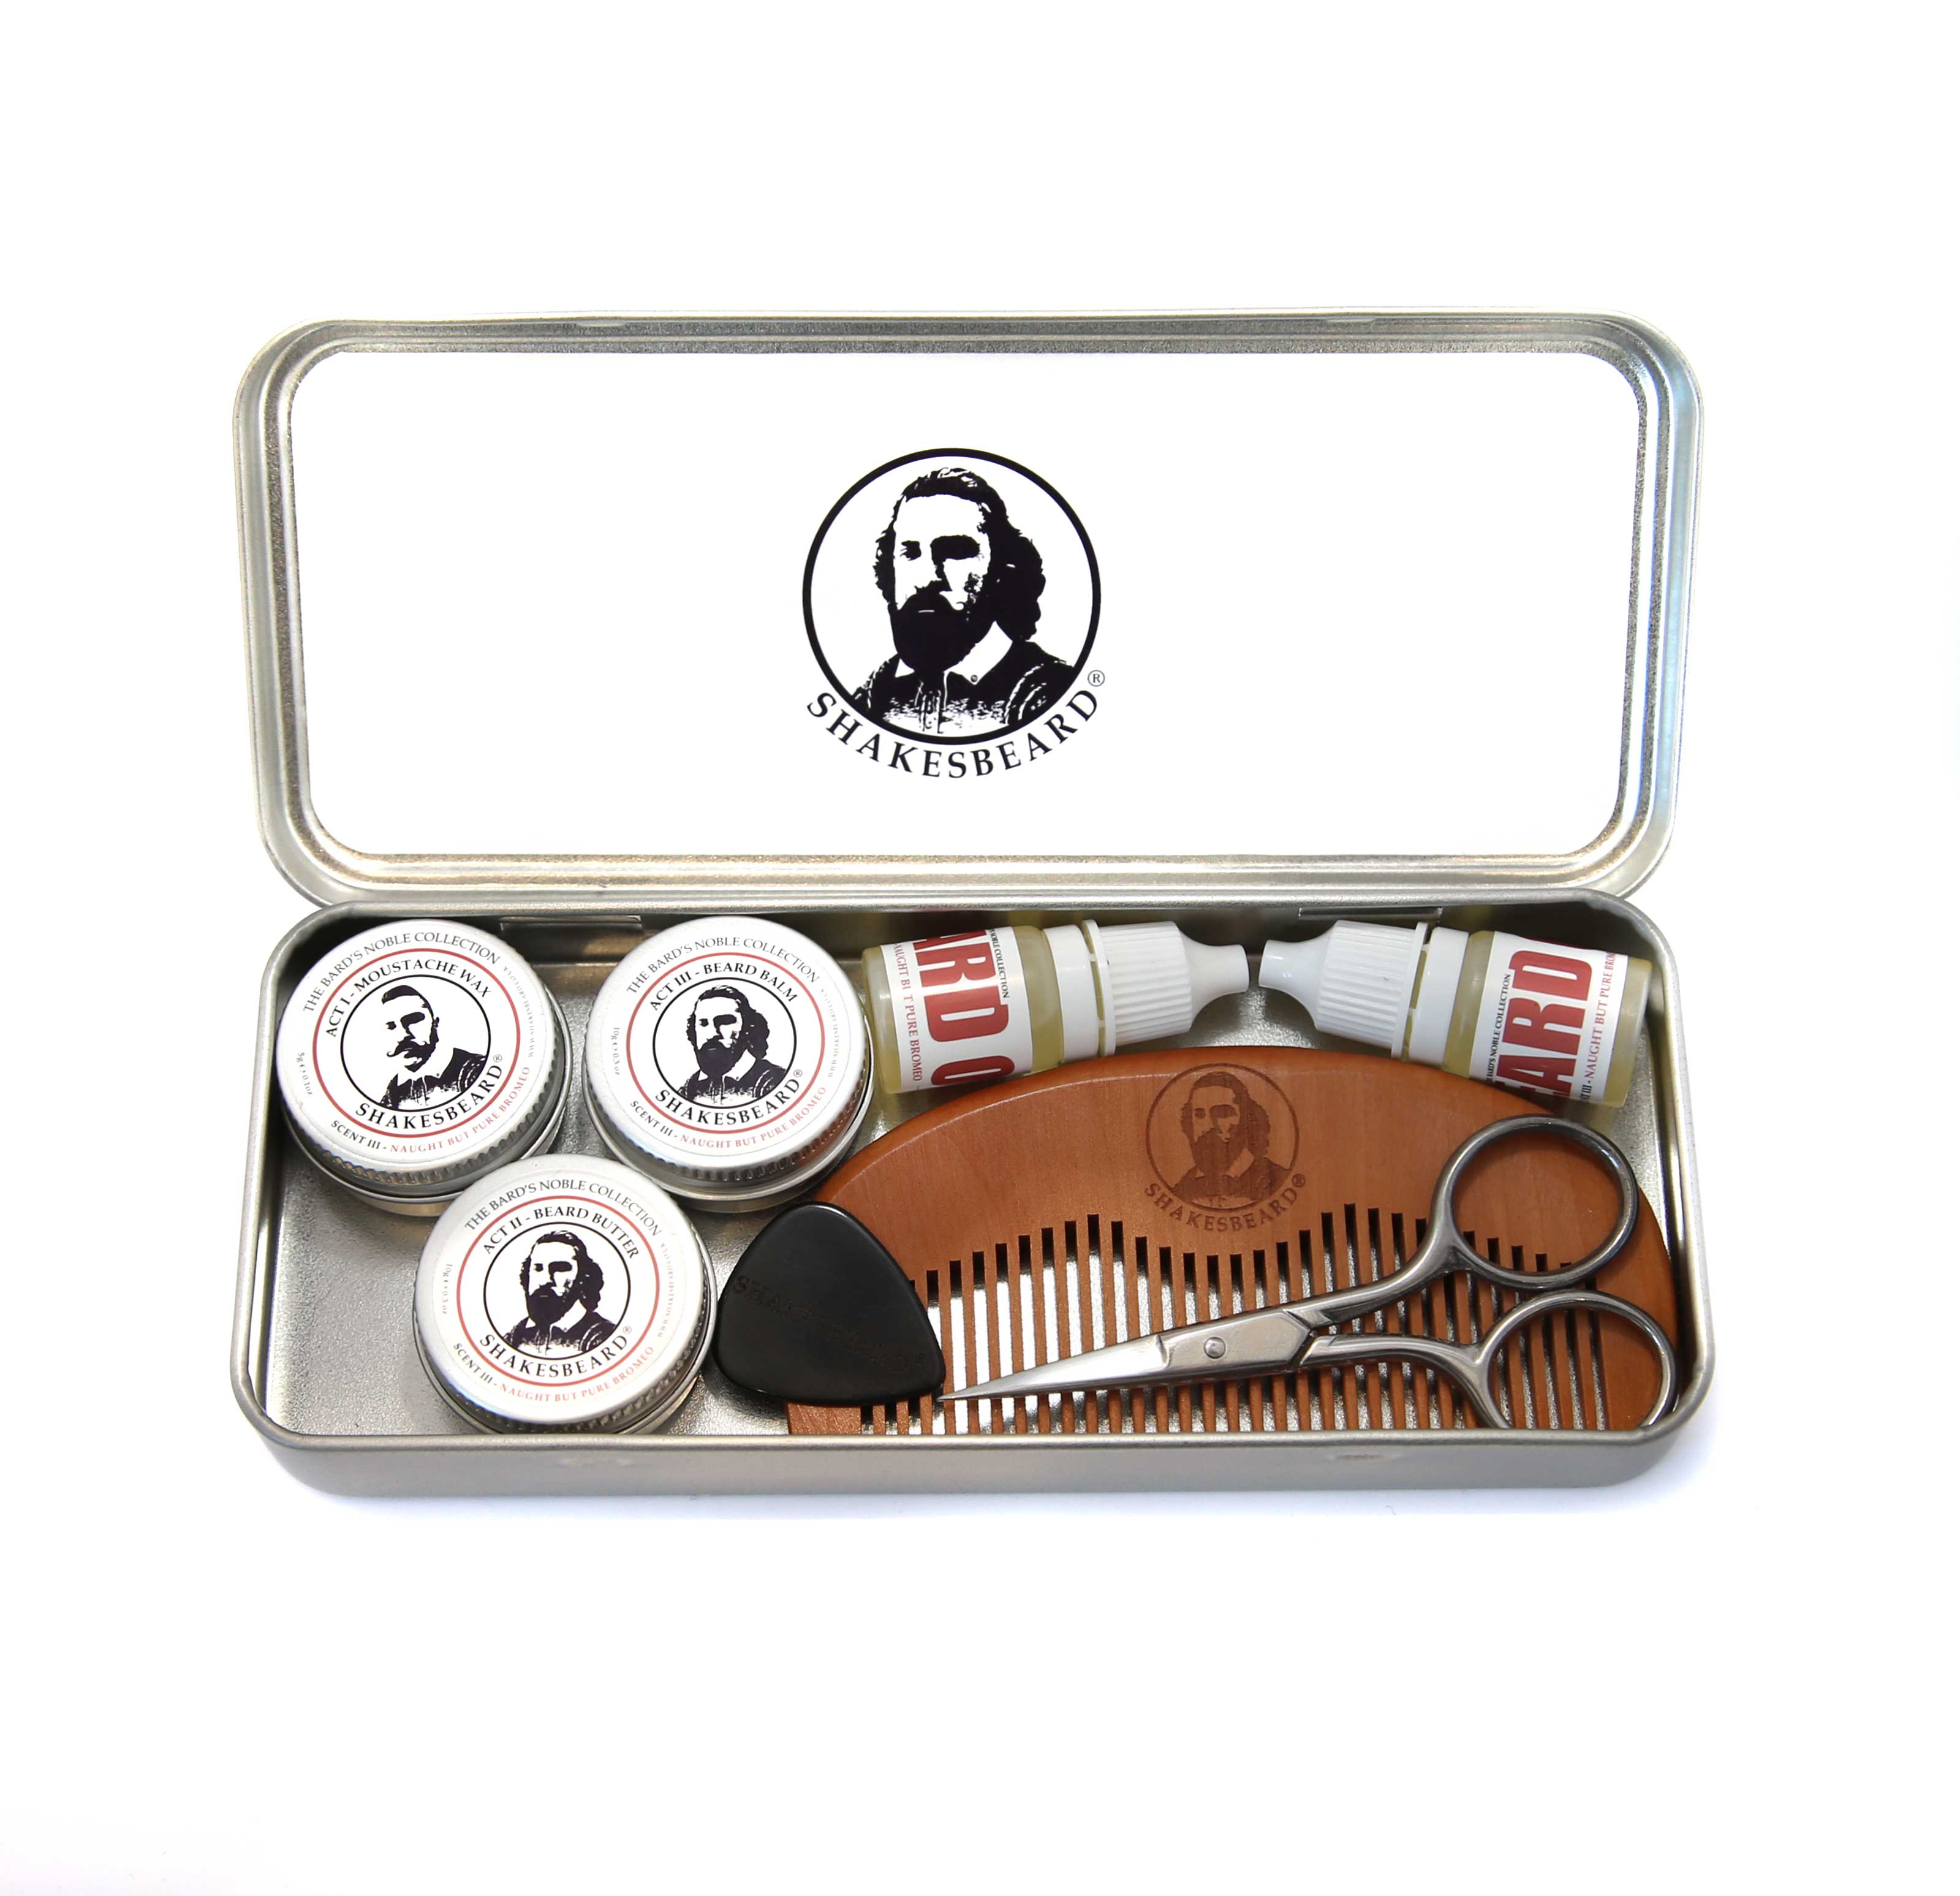 Compact Beard & Moustache Grooming Kit